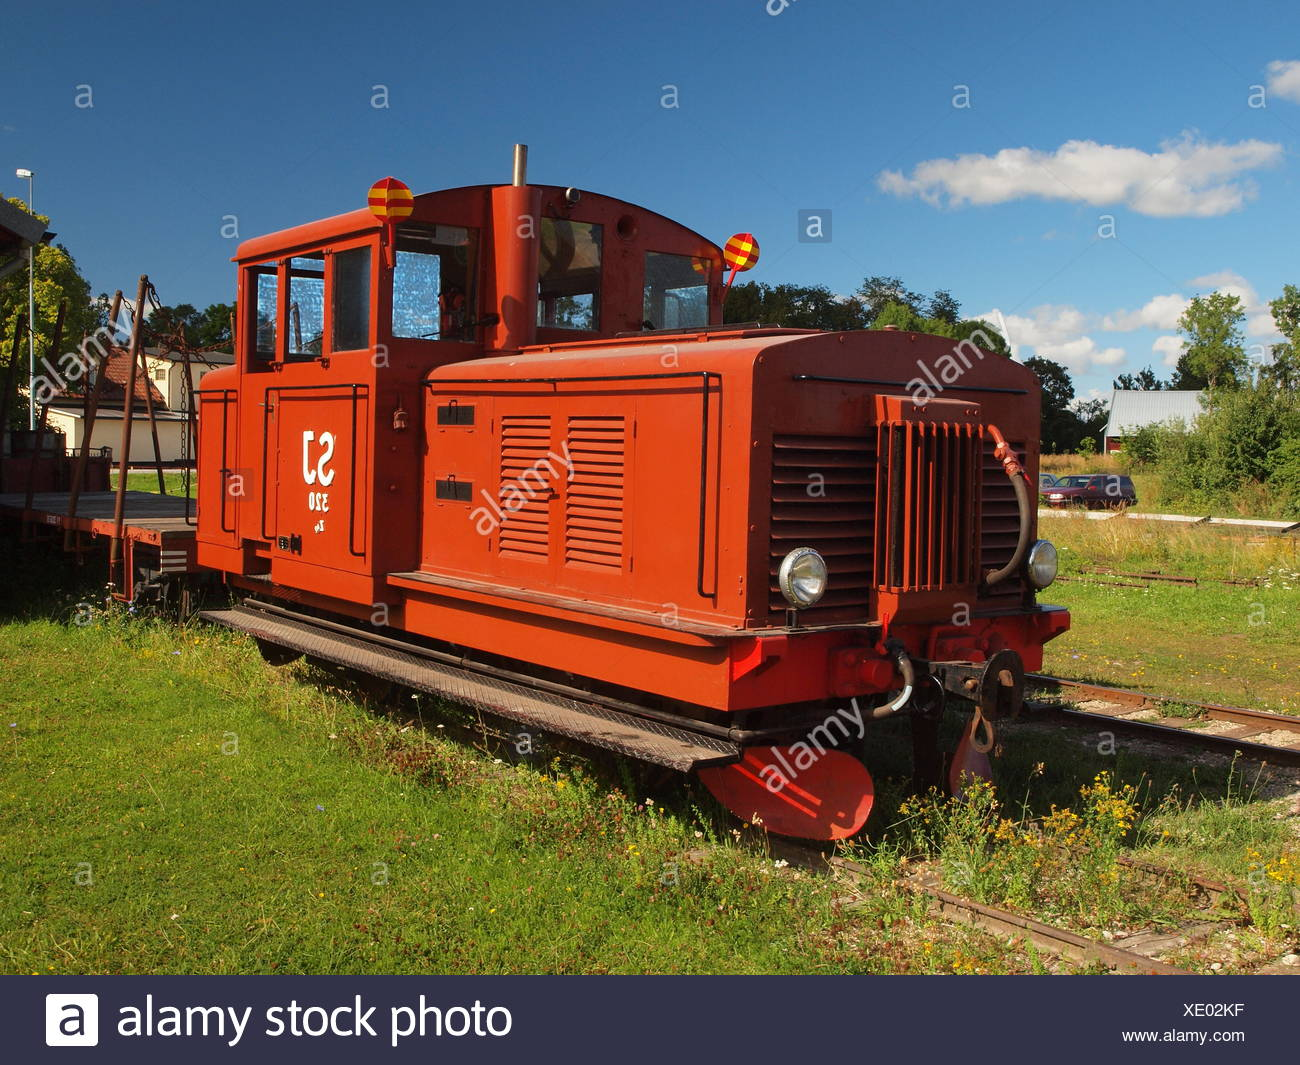 Locomotive - narrow gauge heritage railway - Stock Image